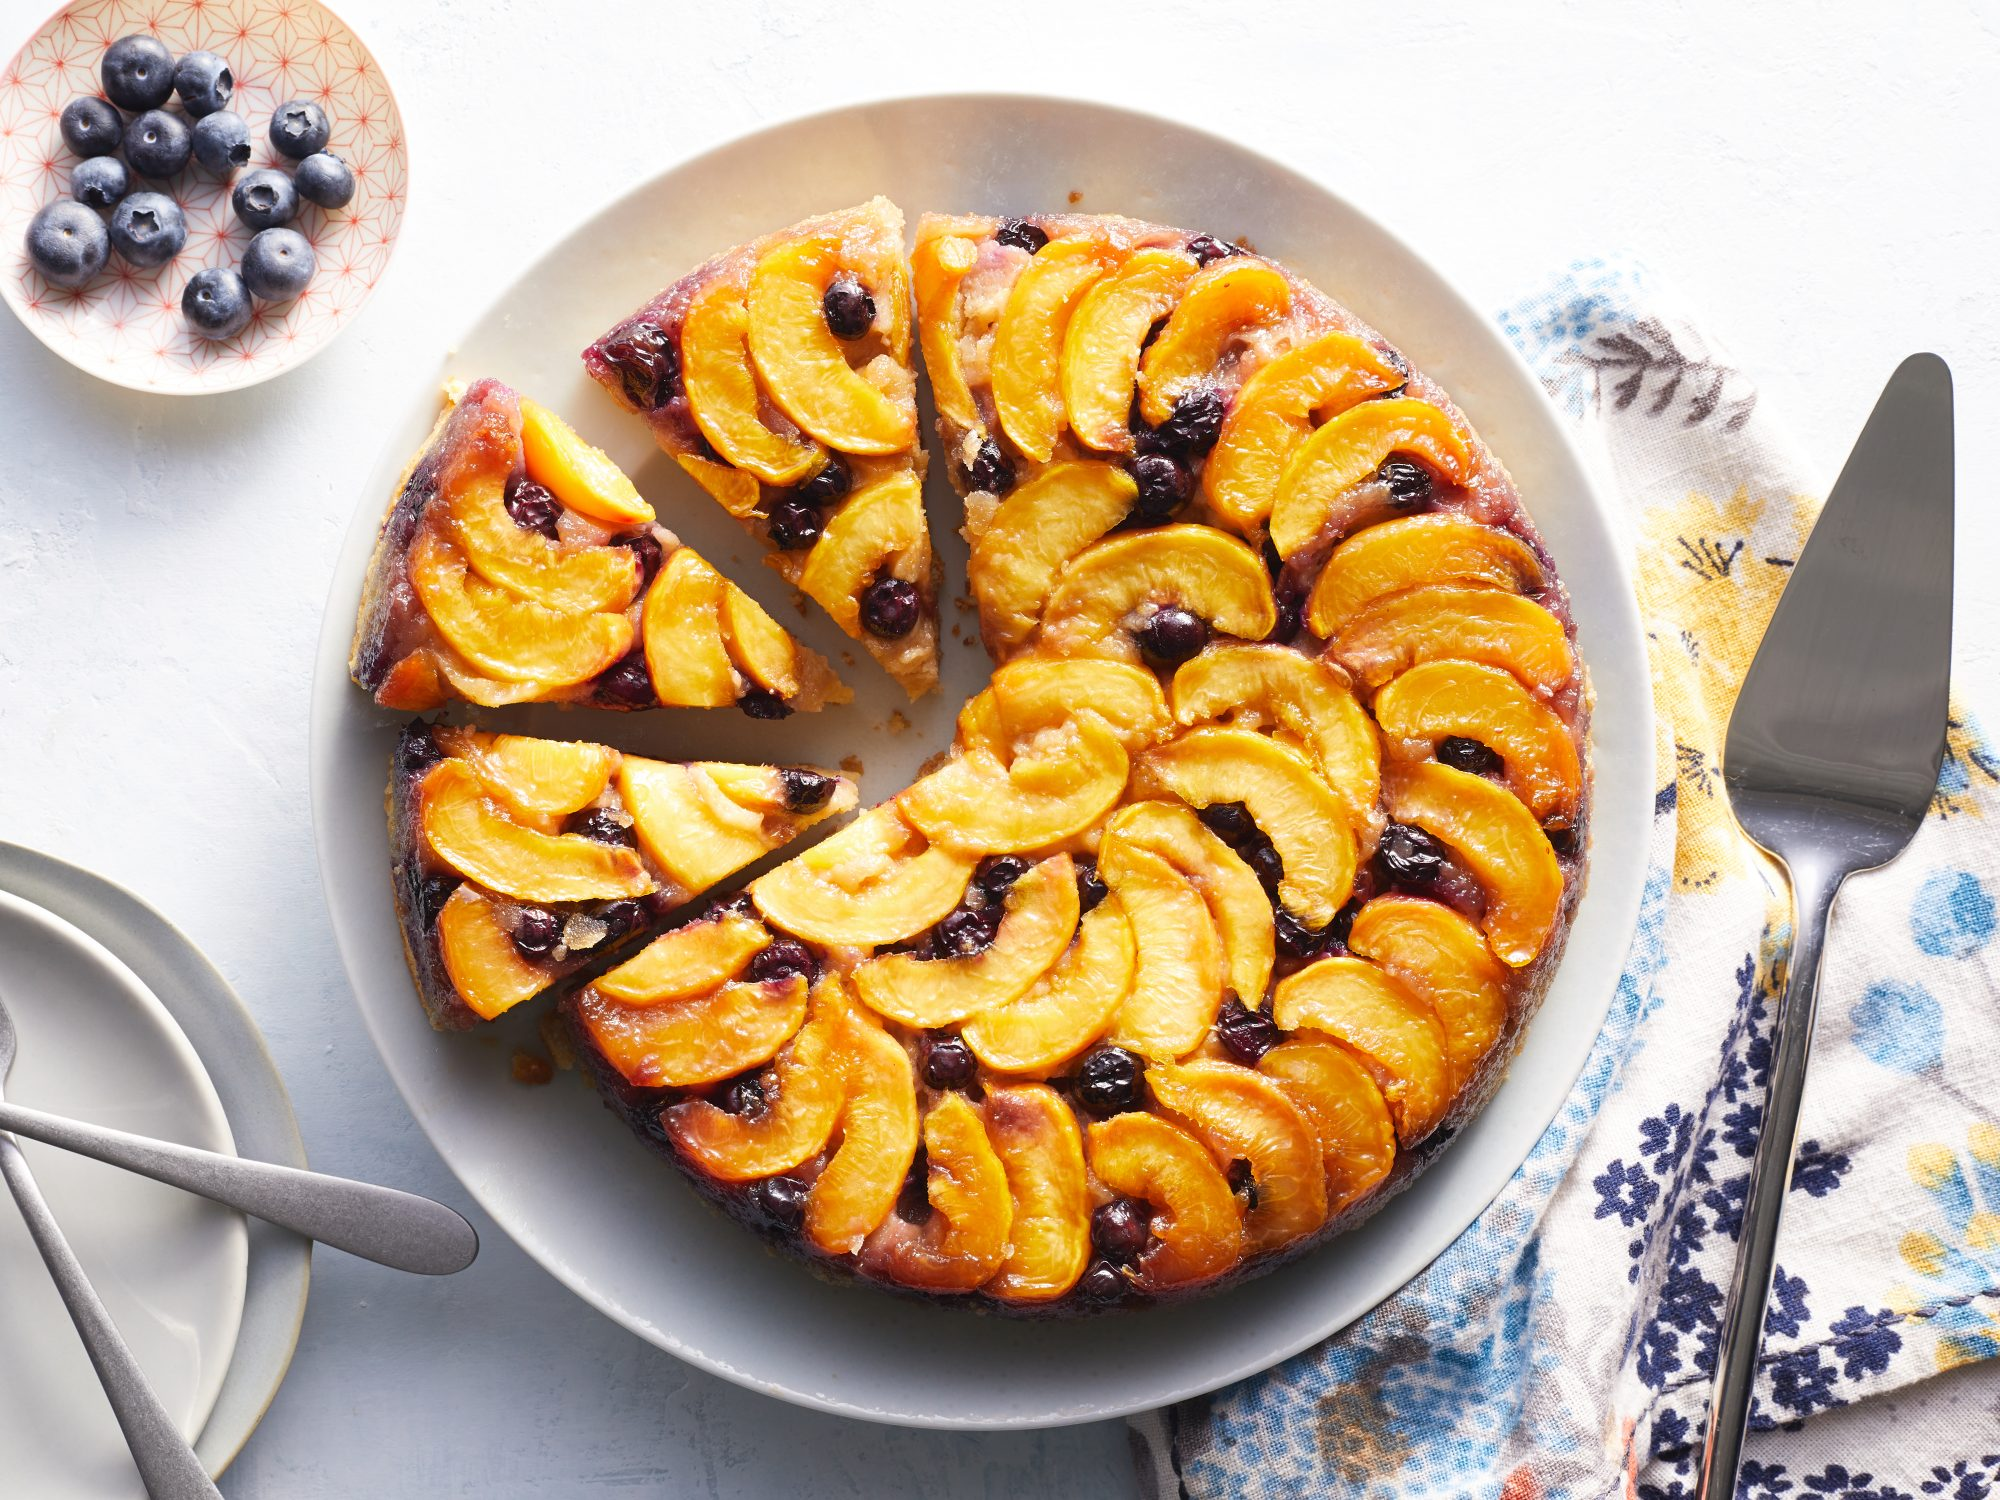 Blueberry-Peach Upside Down Cake image